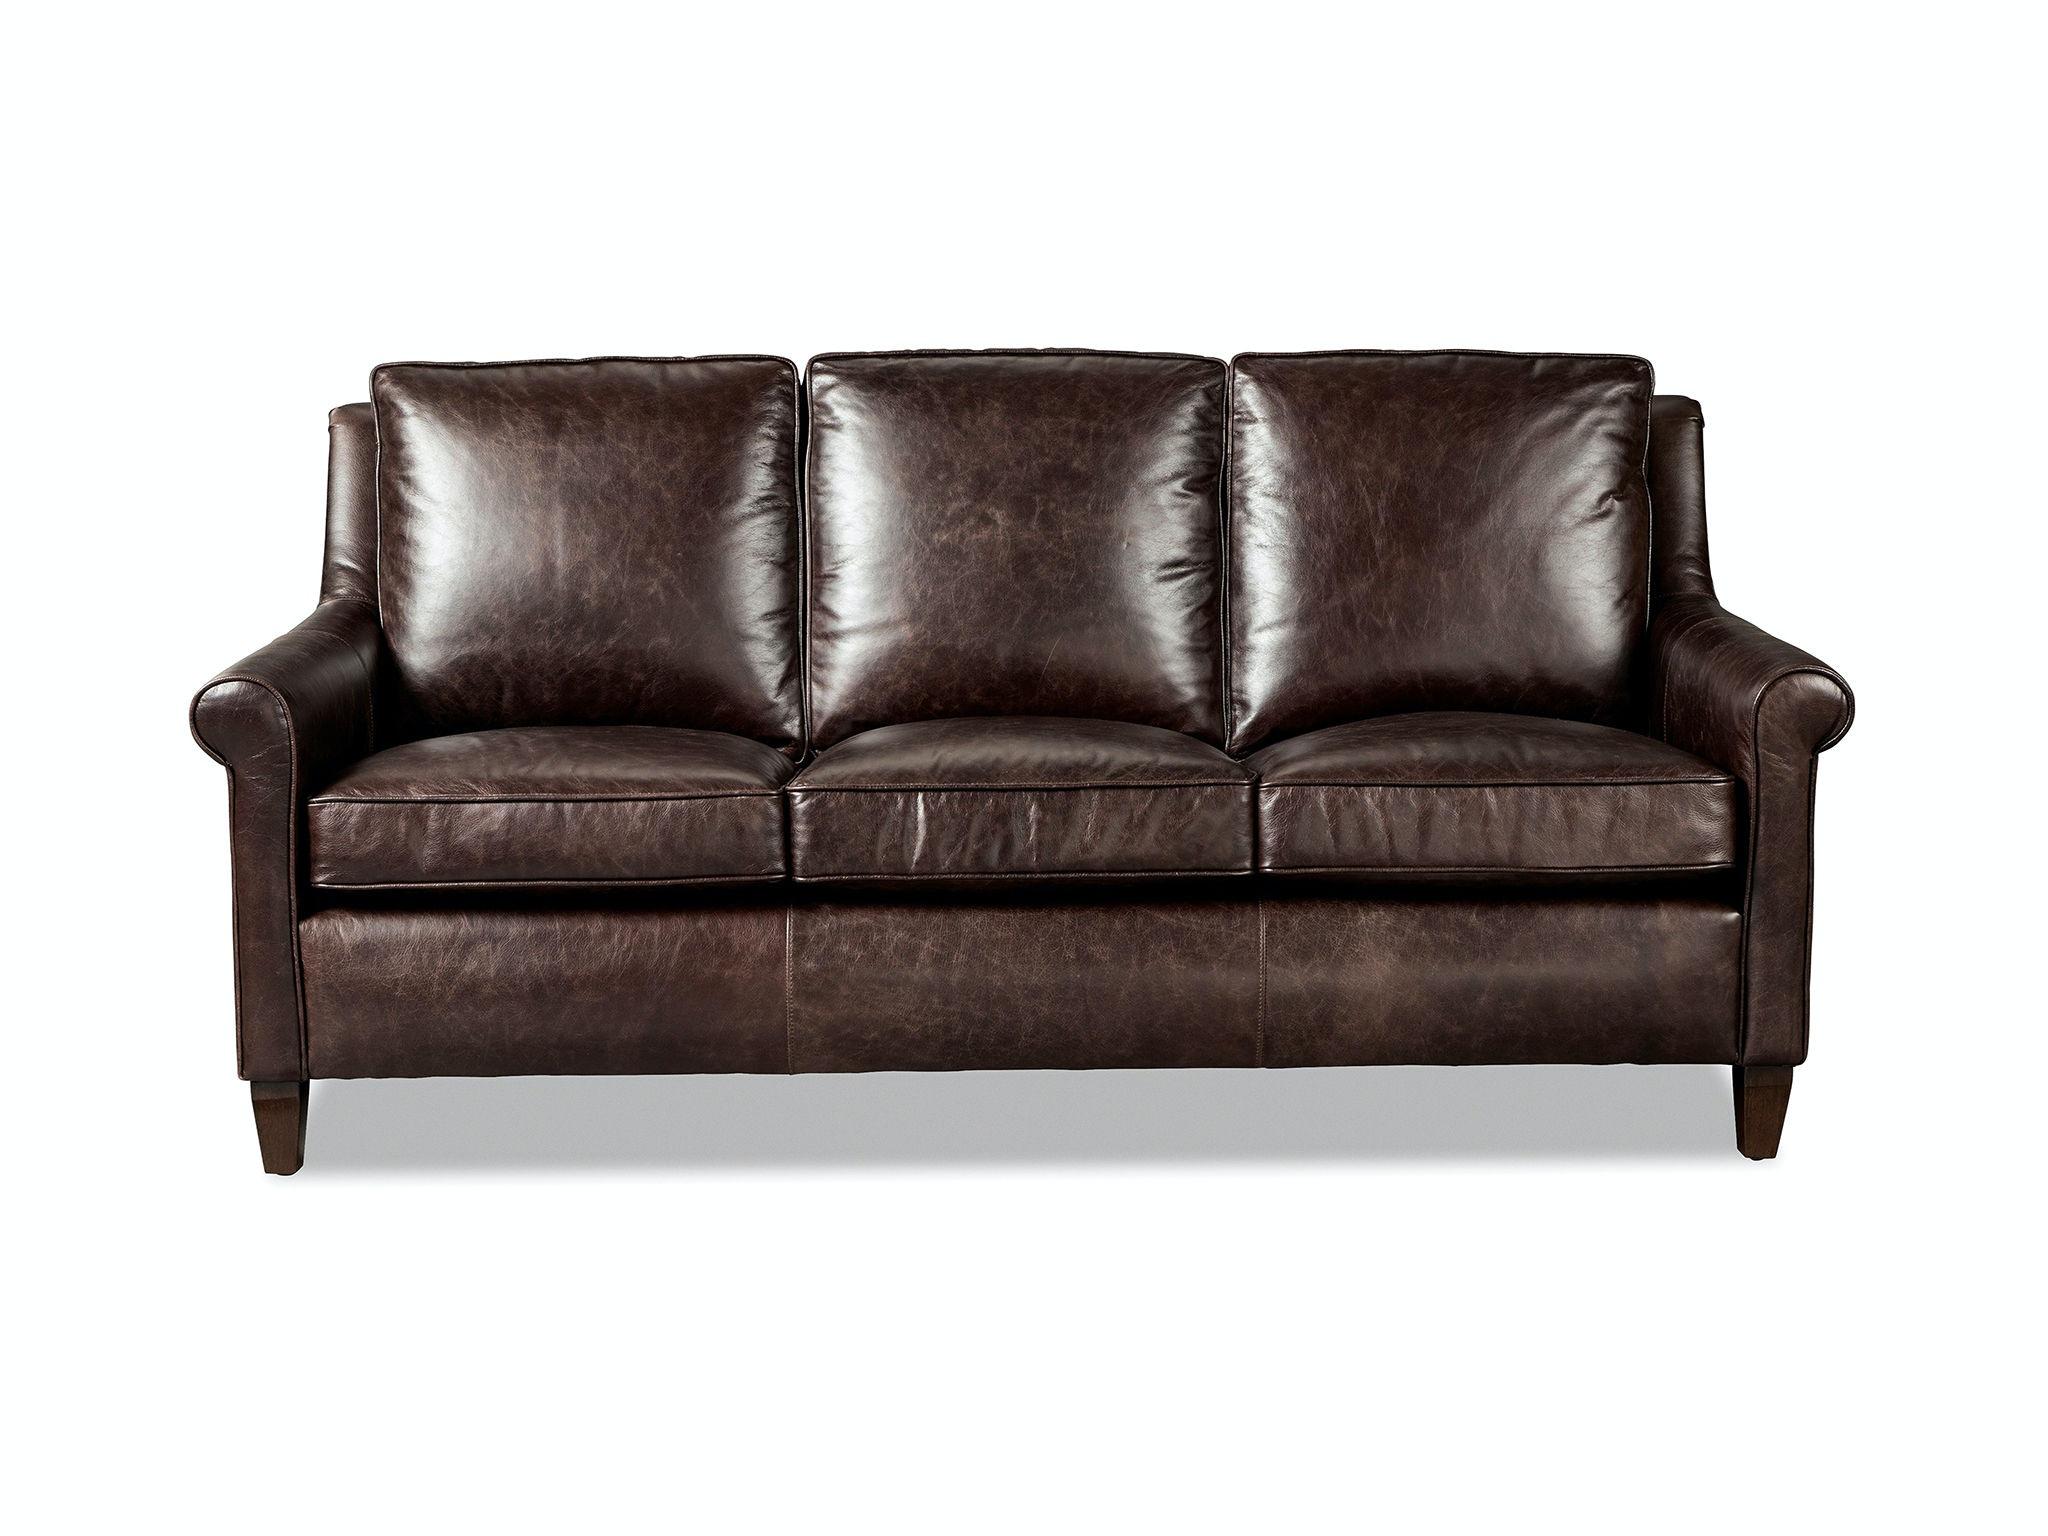 Craftmaster Living Room Sleeper Sofa L17485068 Butterworths of